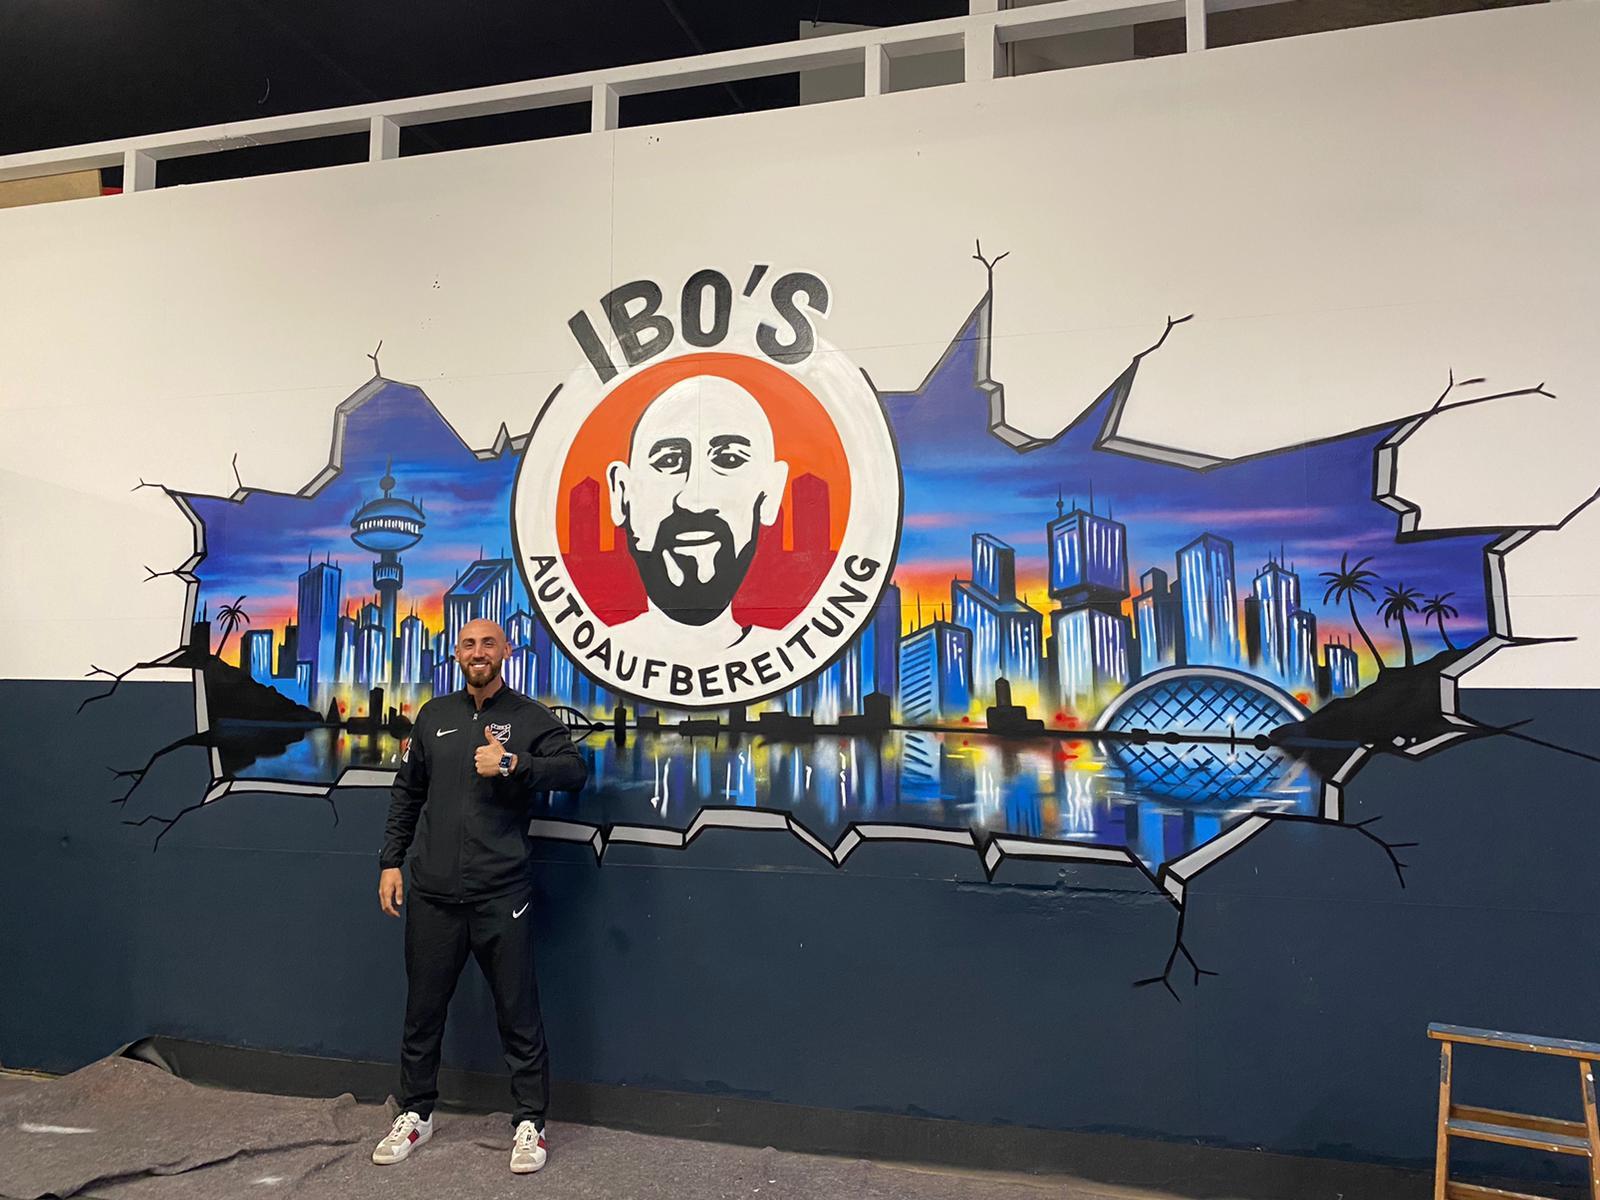 Ibo's Aufbereitung